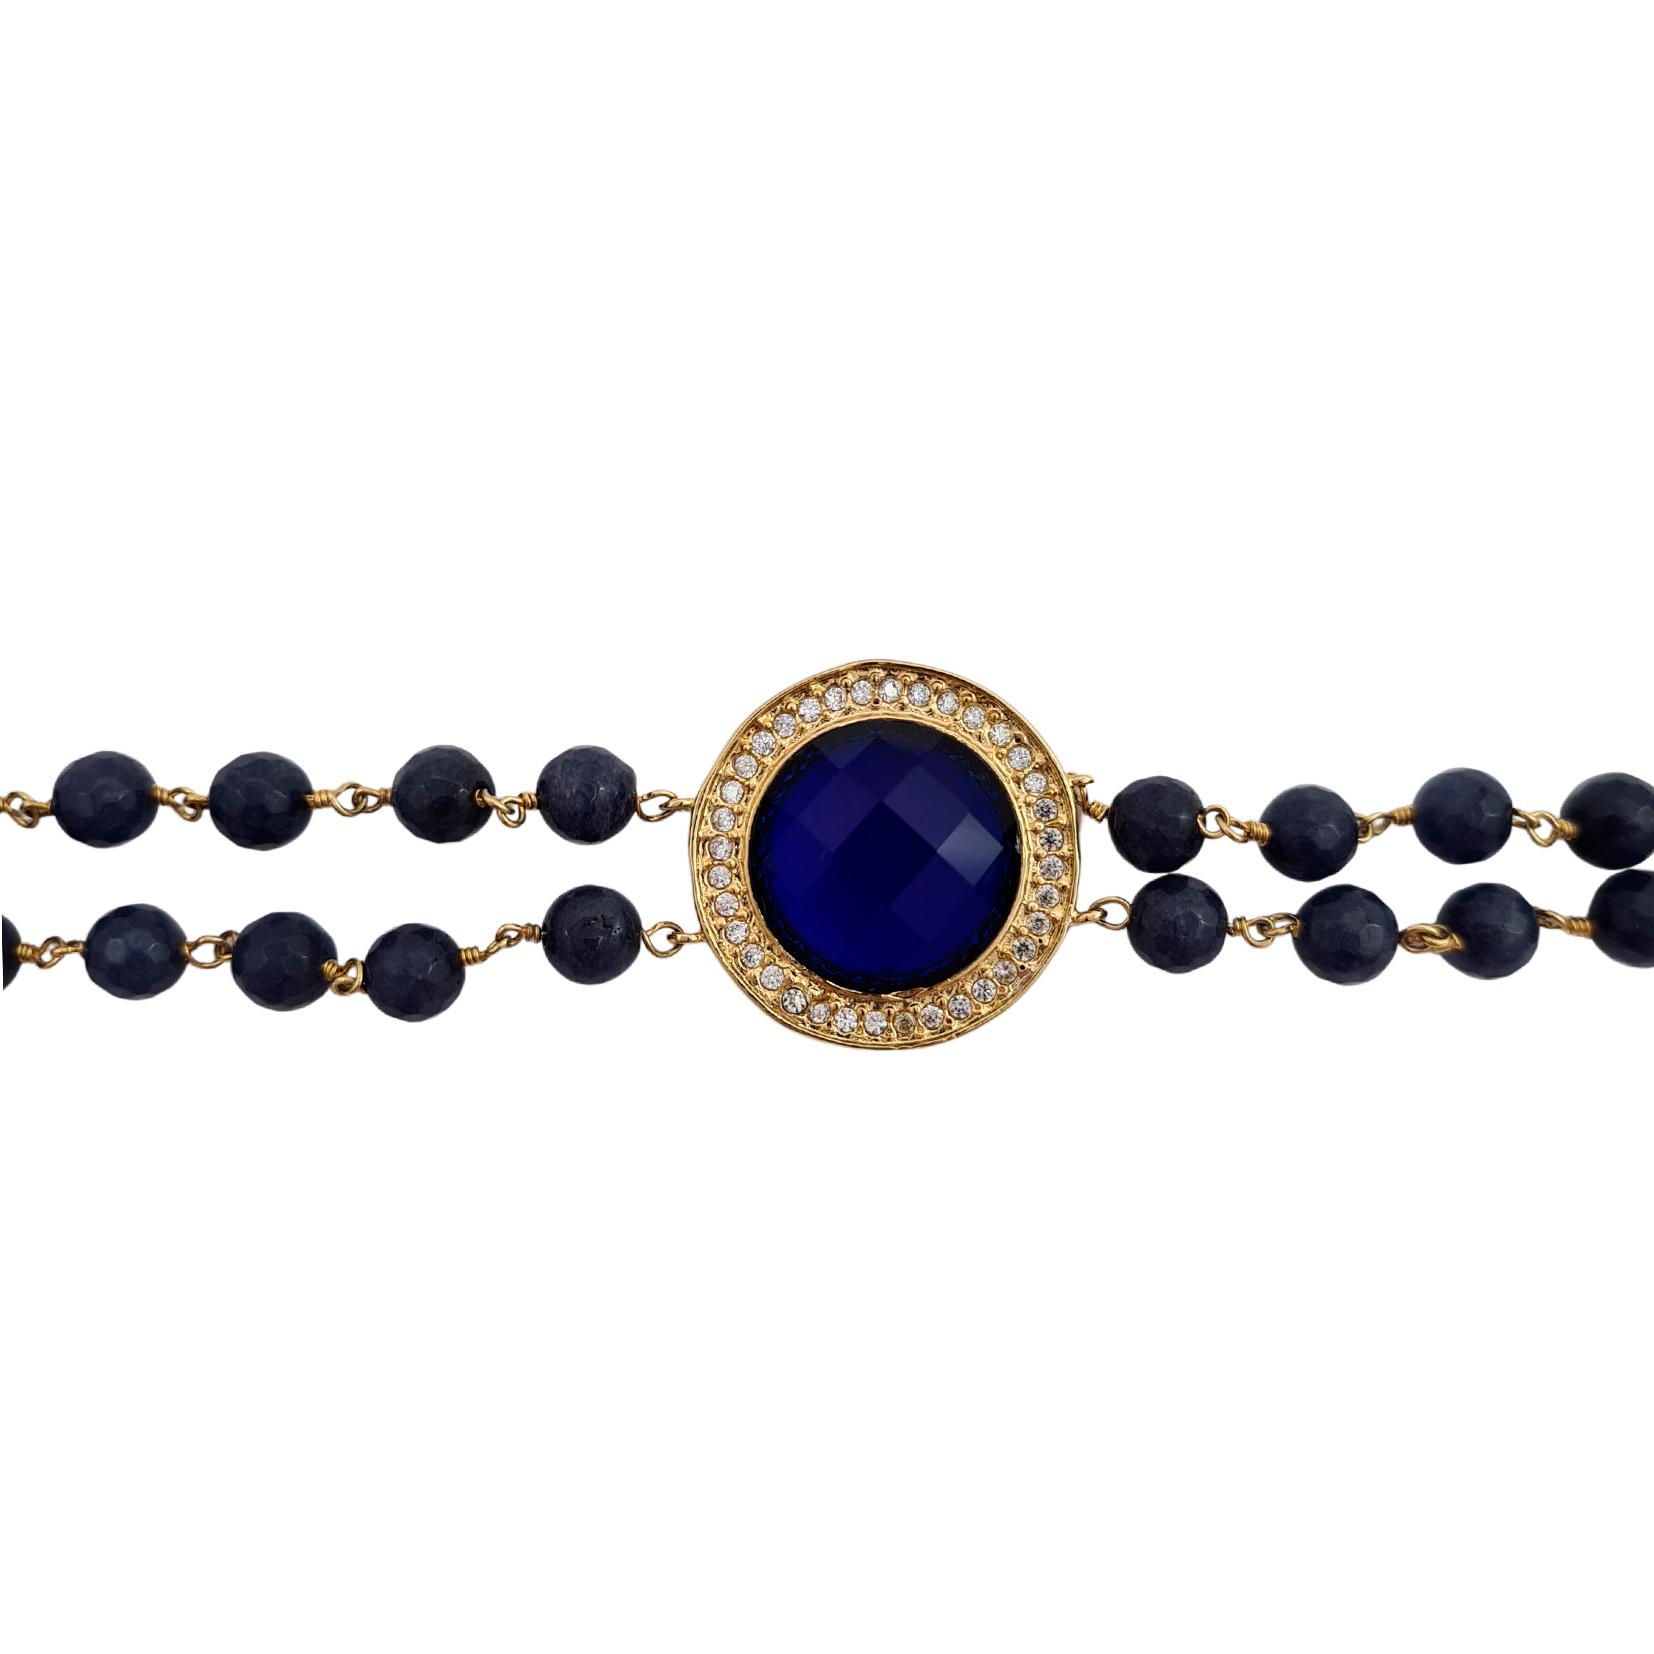 Pulseira de cristal azul com pedra sodalita e micro zircônia banhado a ouro 18k